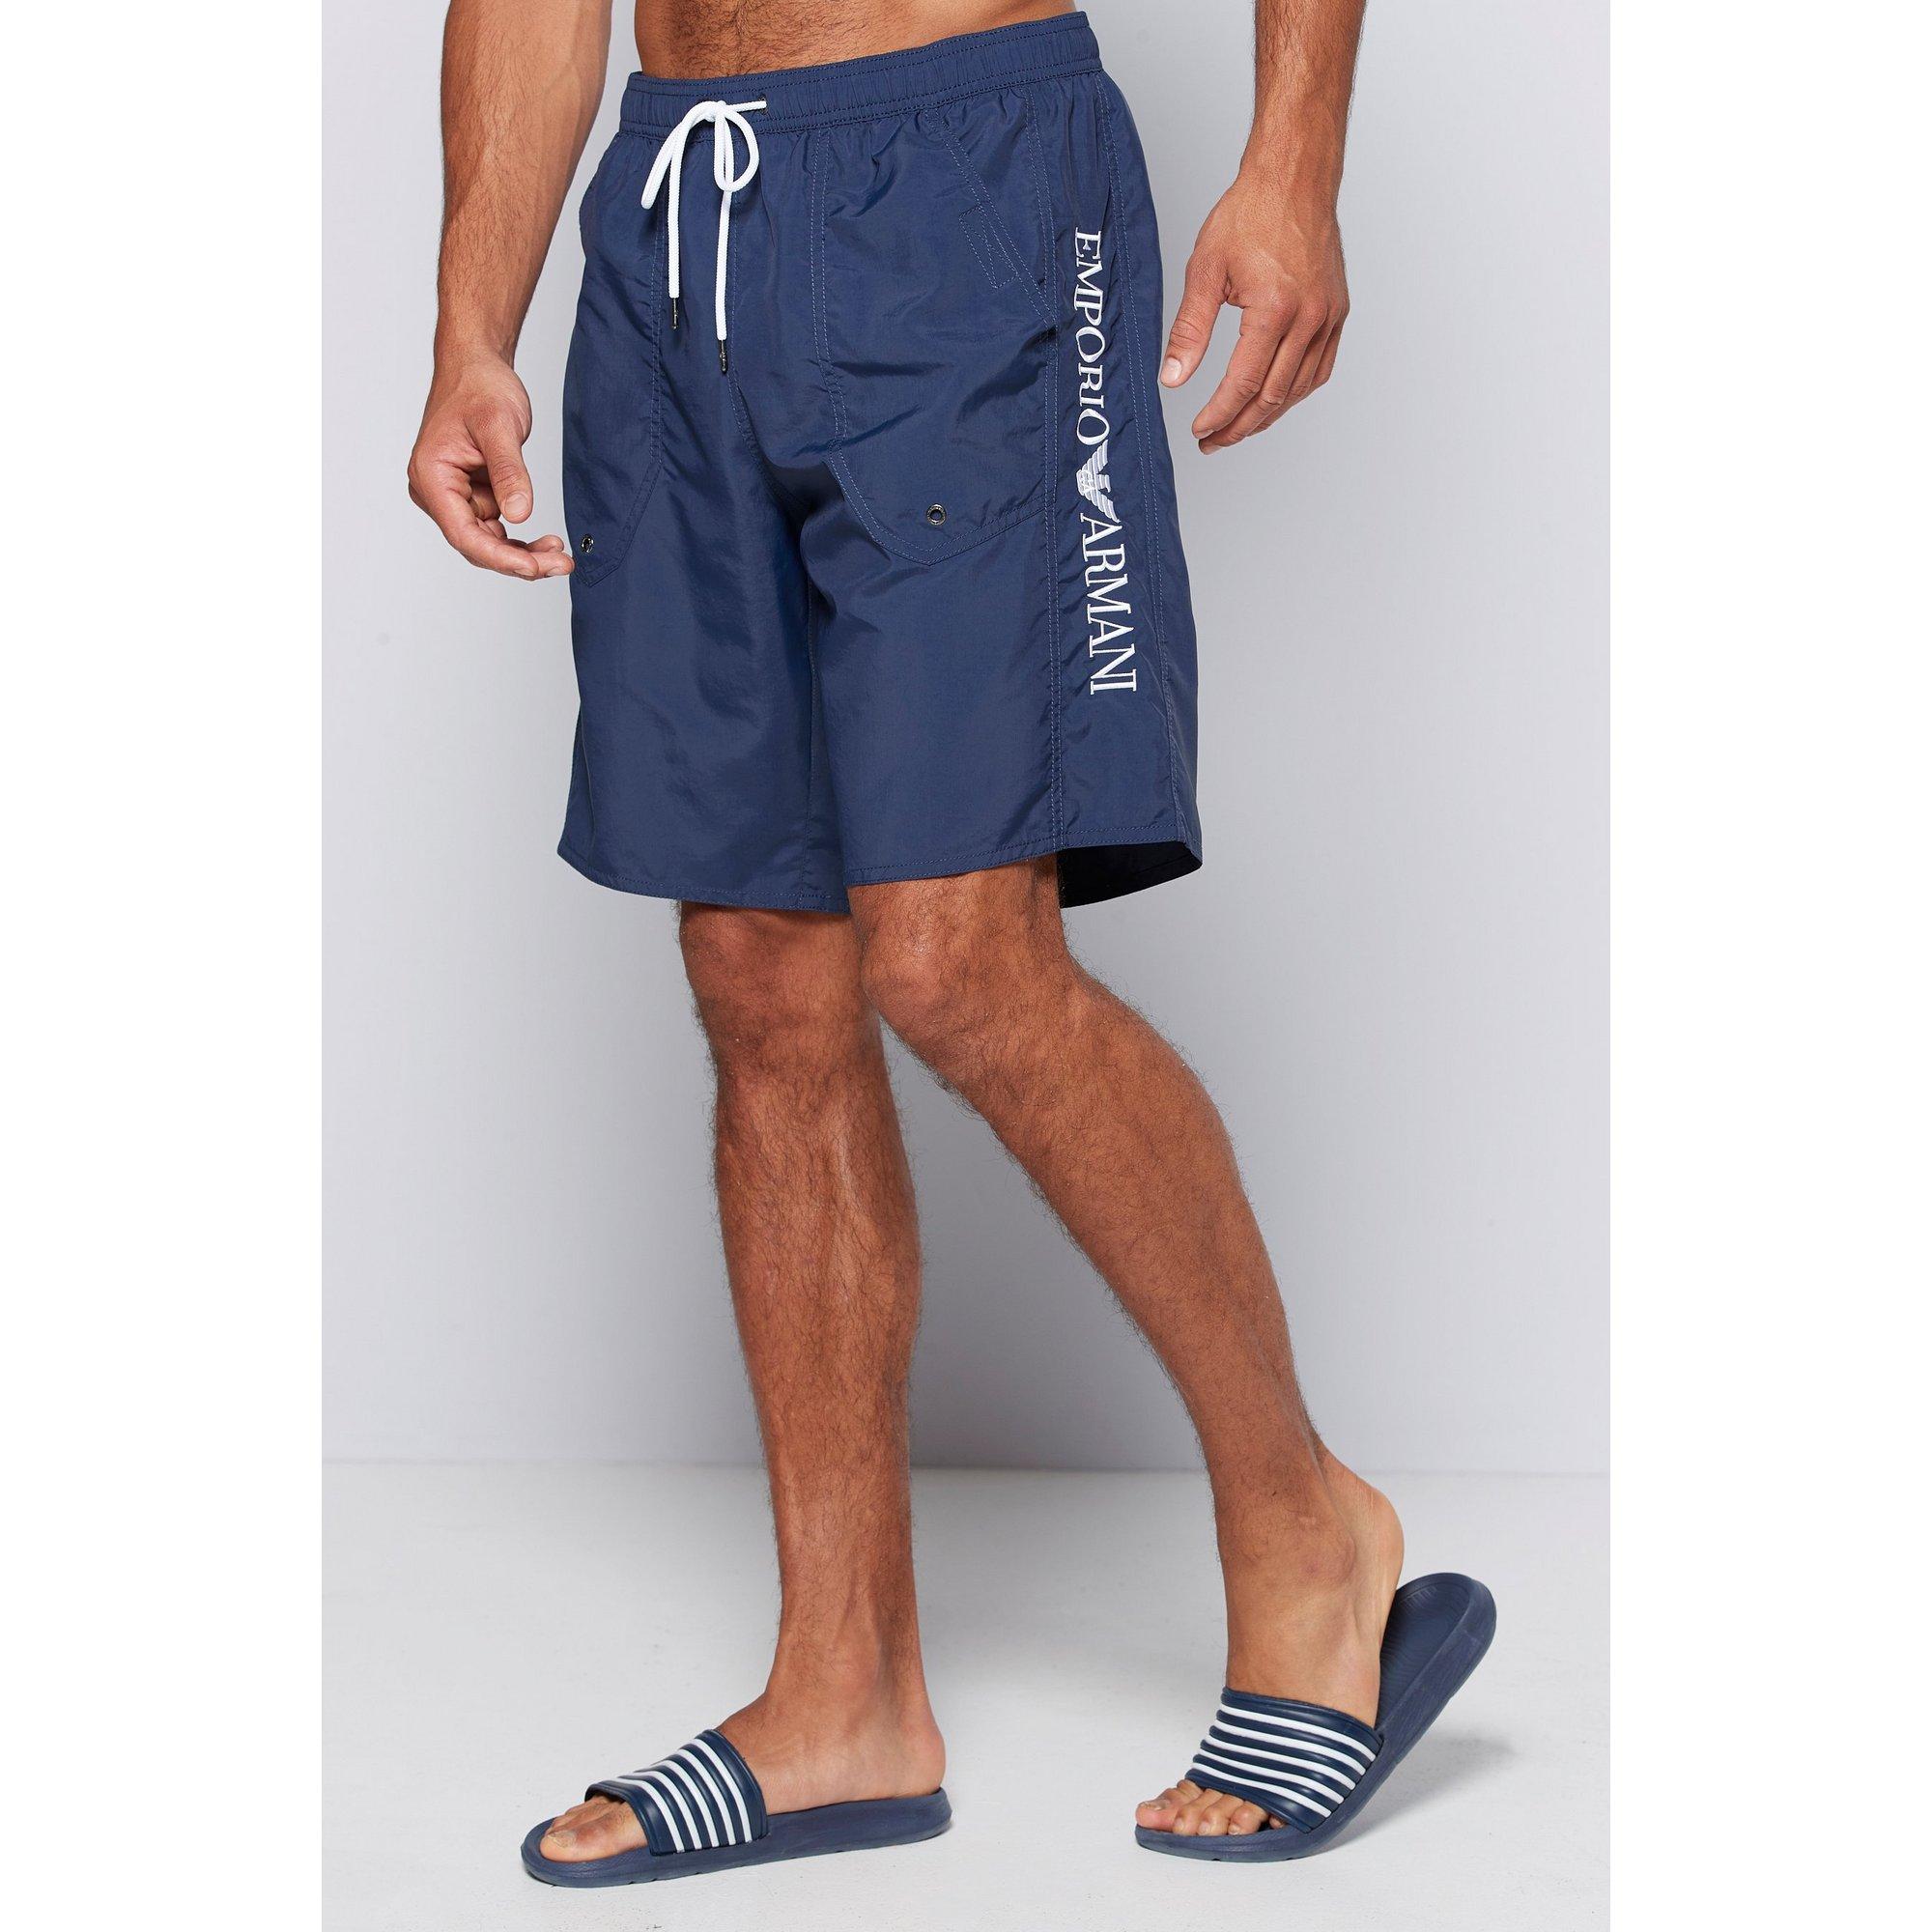 Image of Emporio Armani Branded Navy Swim Shorts